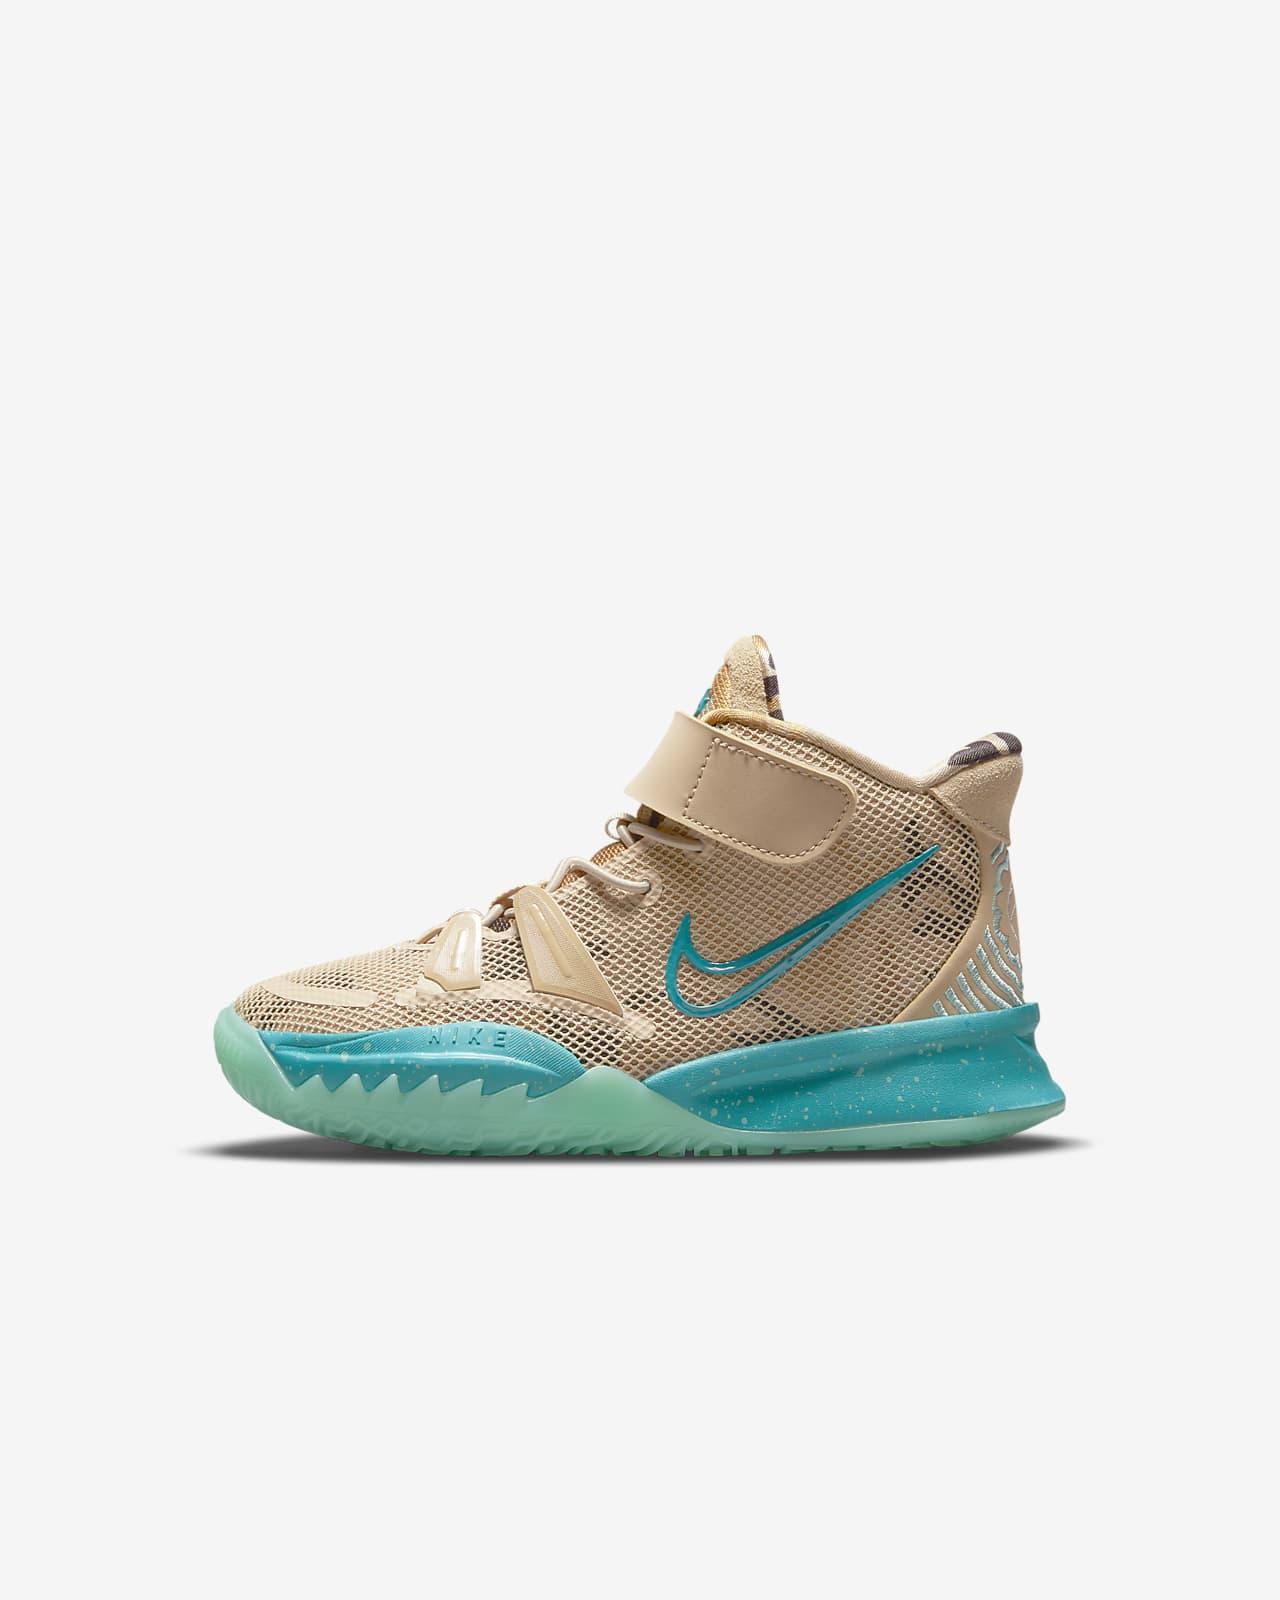 Kyrie 7 Little Kids' Shoes